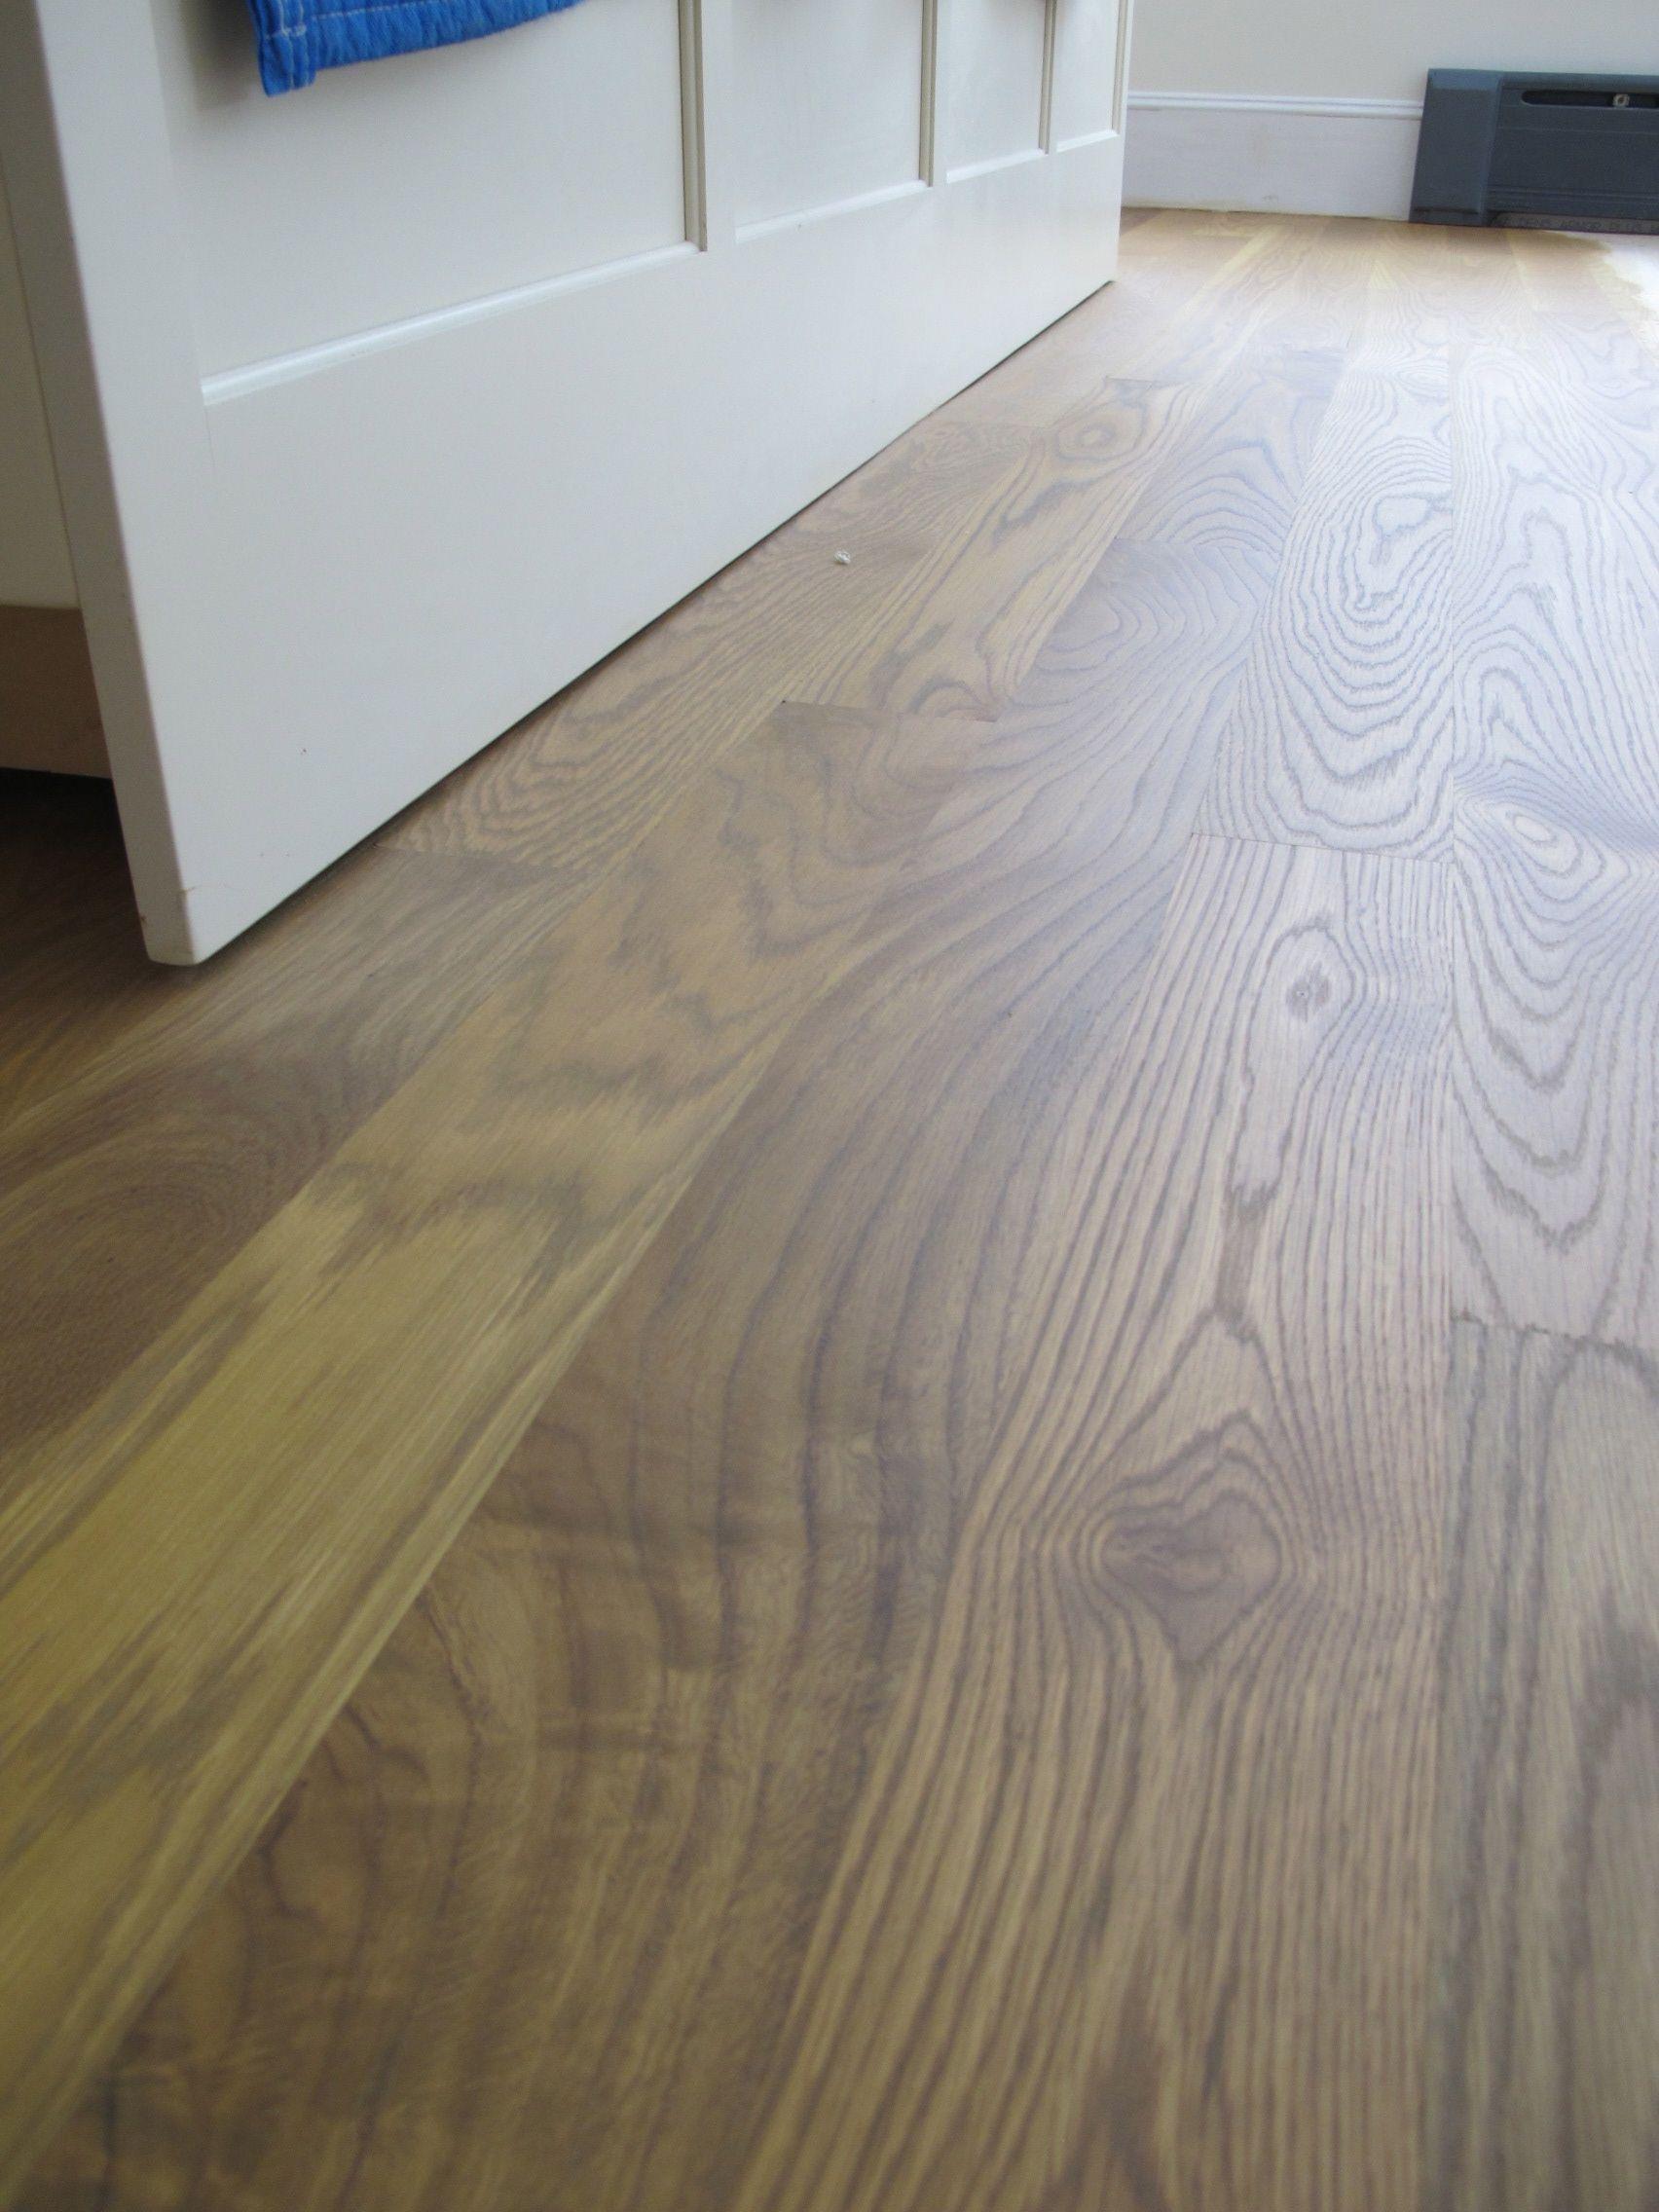 Smoked Oak Rubio Monocoat Rubio Monocoat Hardwood Floors Flooring